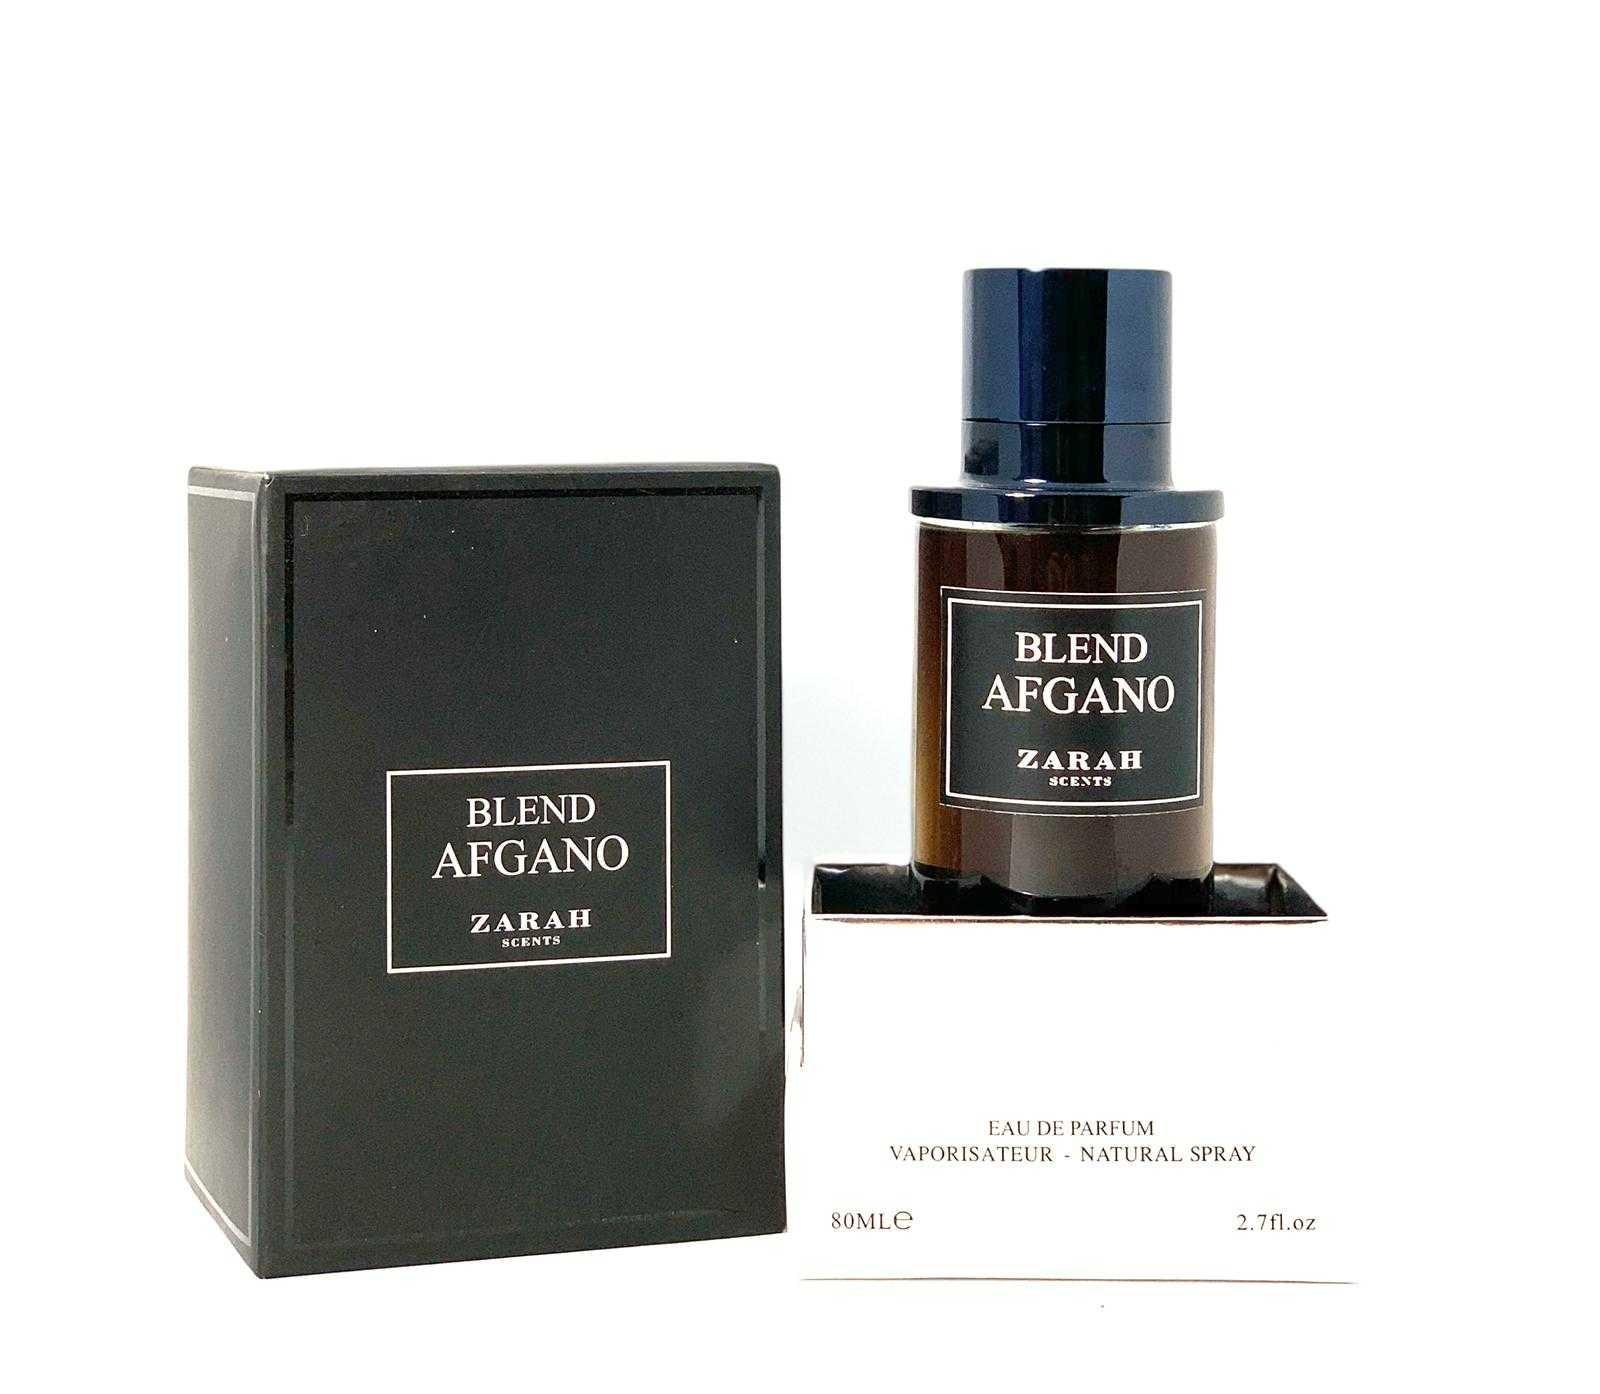 Apa de Parfum Arabesc Blend Afgano unisex 80ml